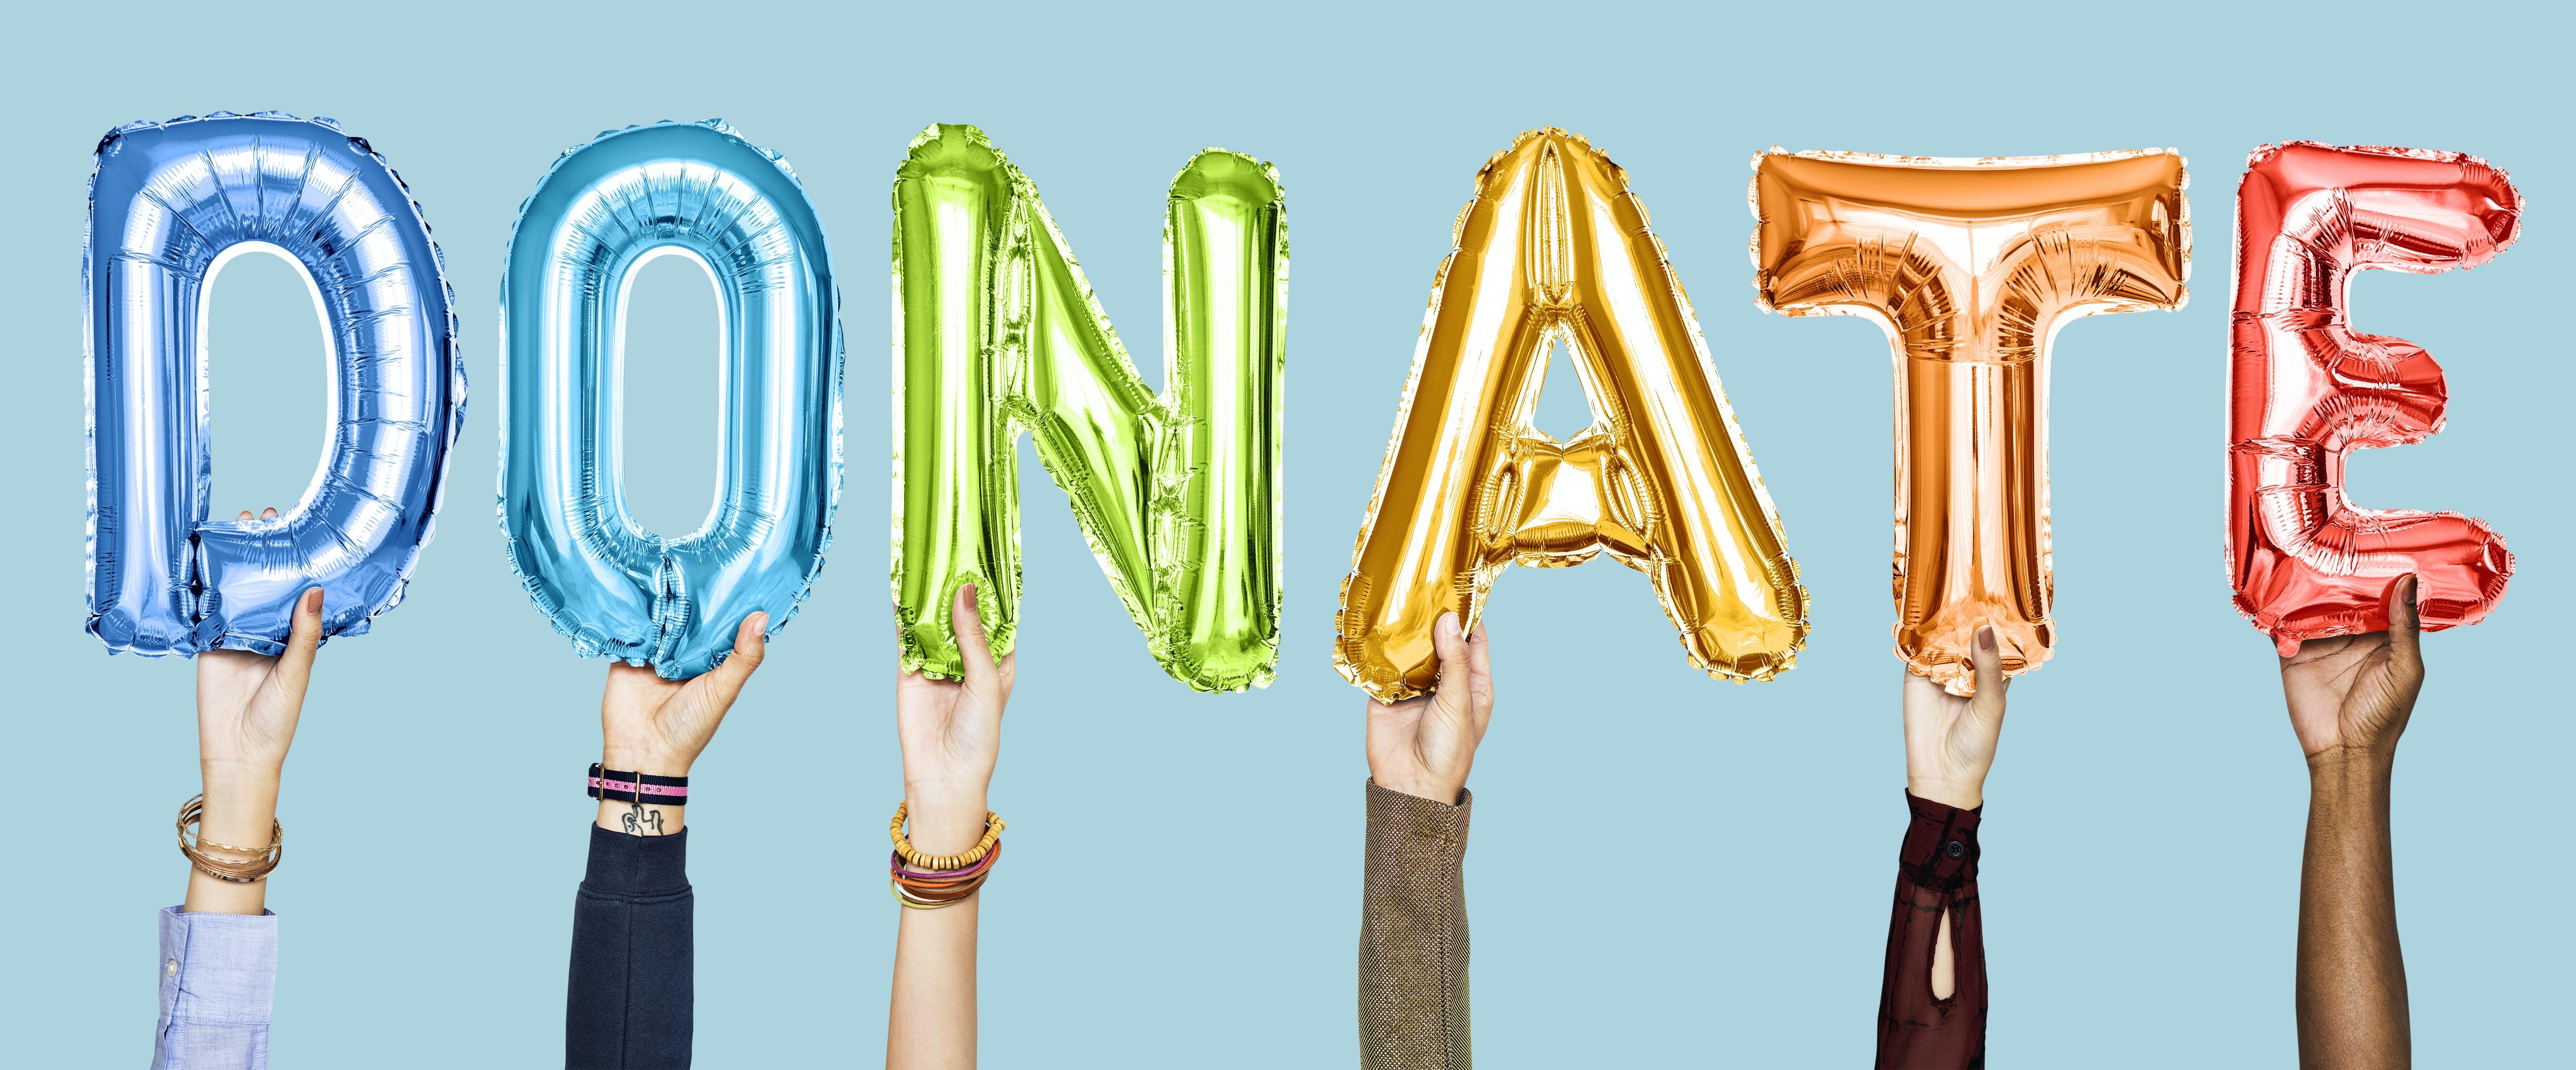 Donate mylar balloon decors